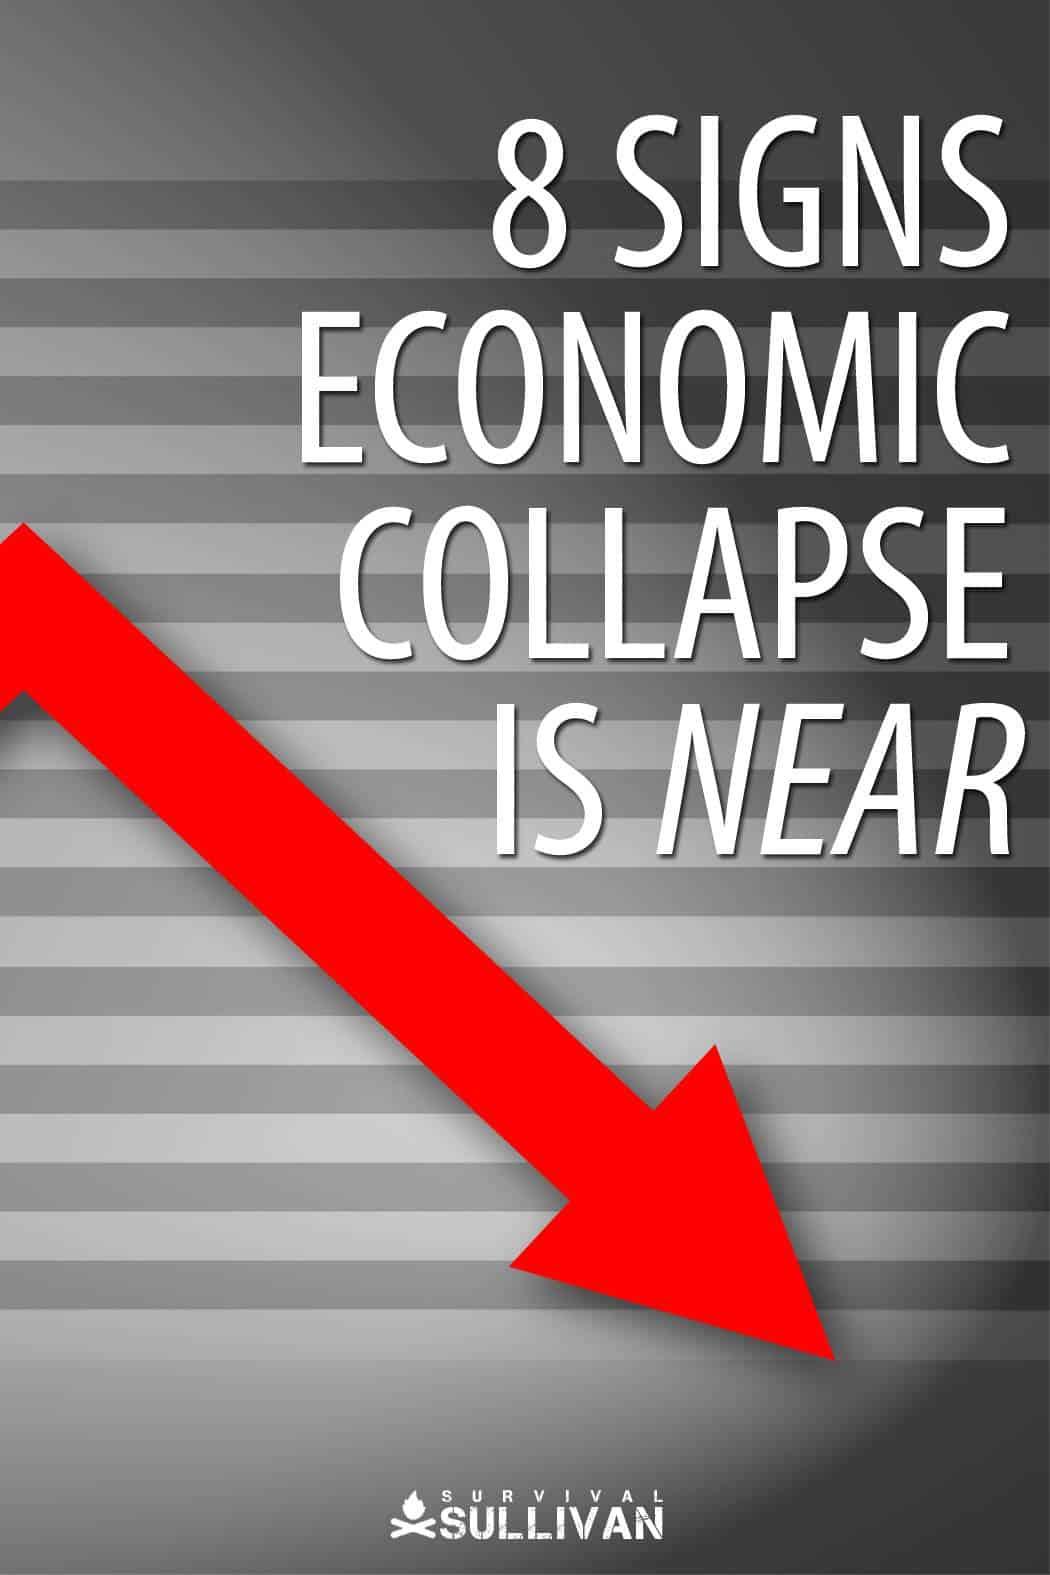 economic collapse Pinterest image